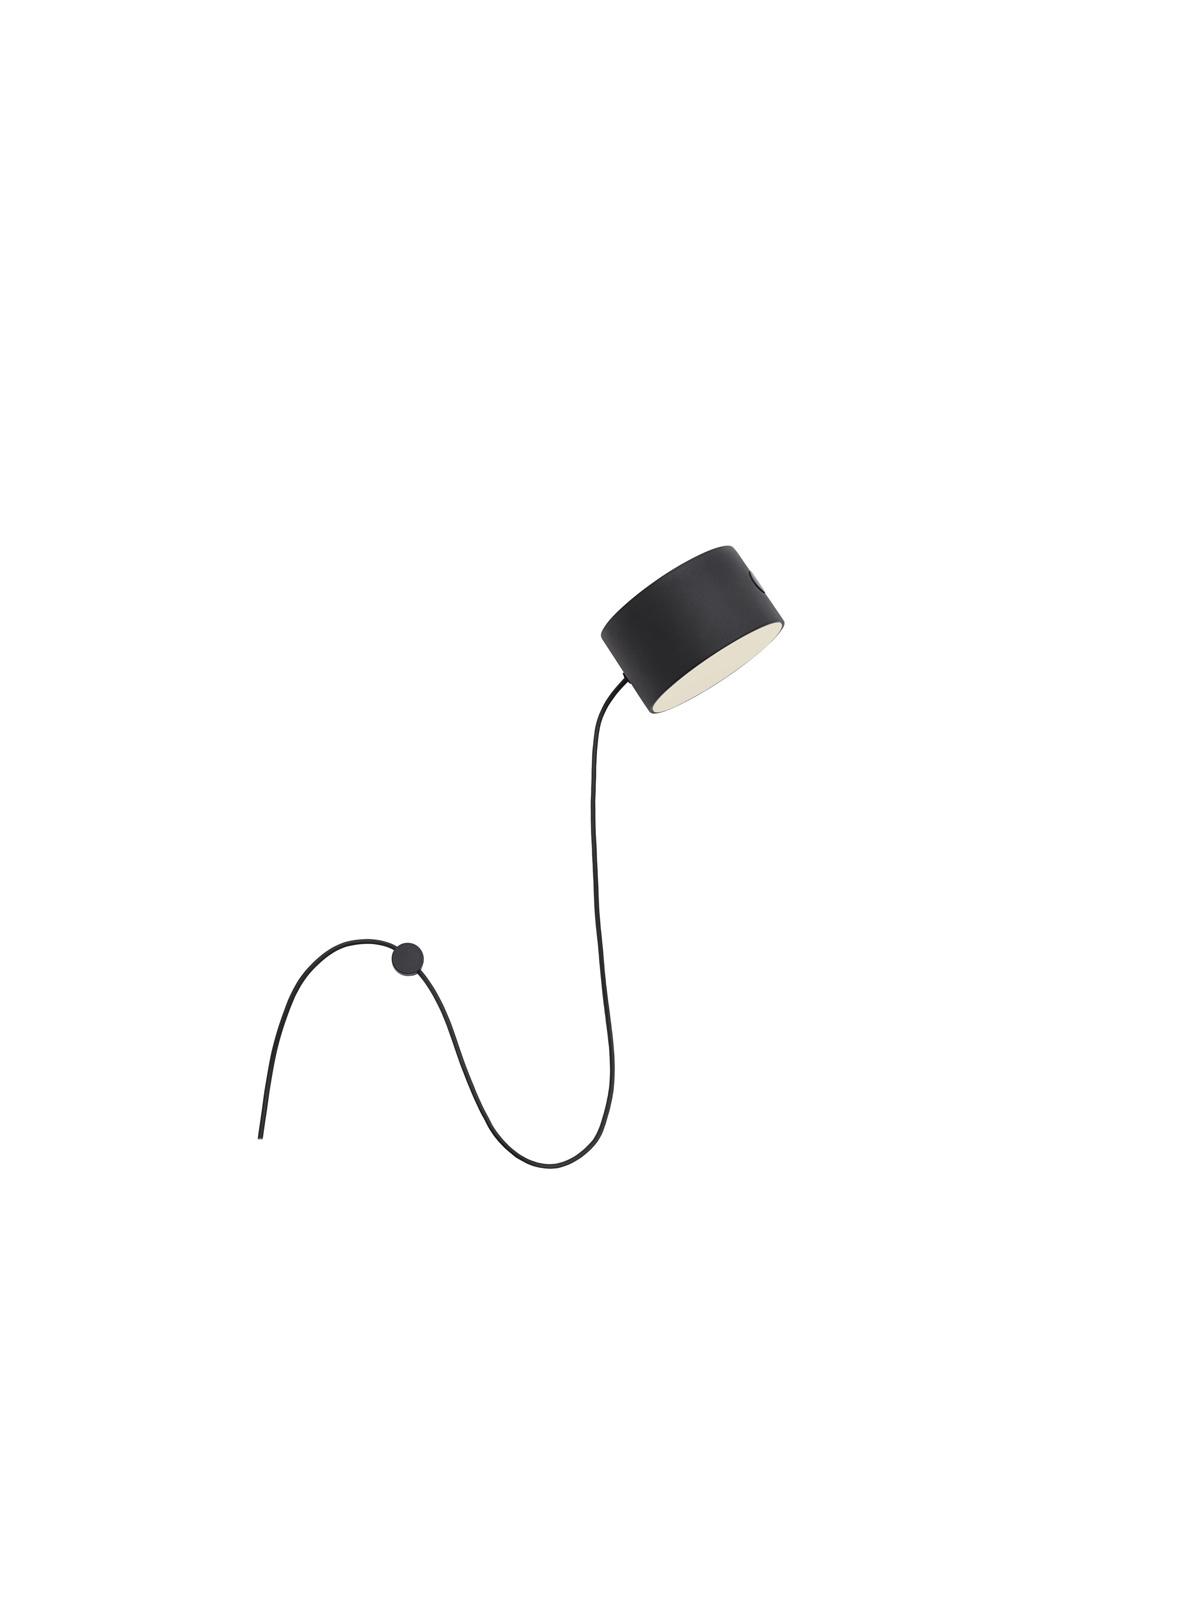 Post Lamp Wall muuto Wandleuchte DesignOrt Onlineshop Lampen Berlin